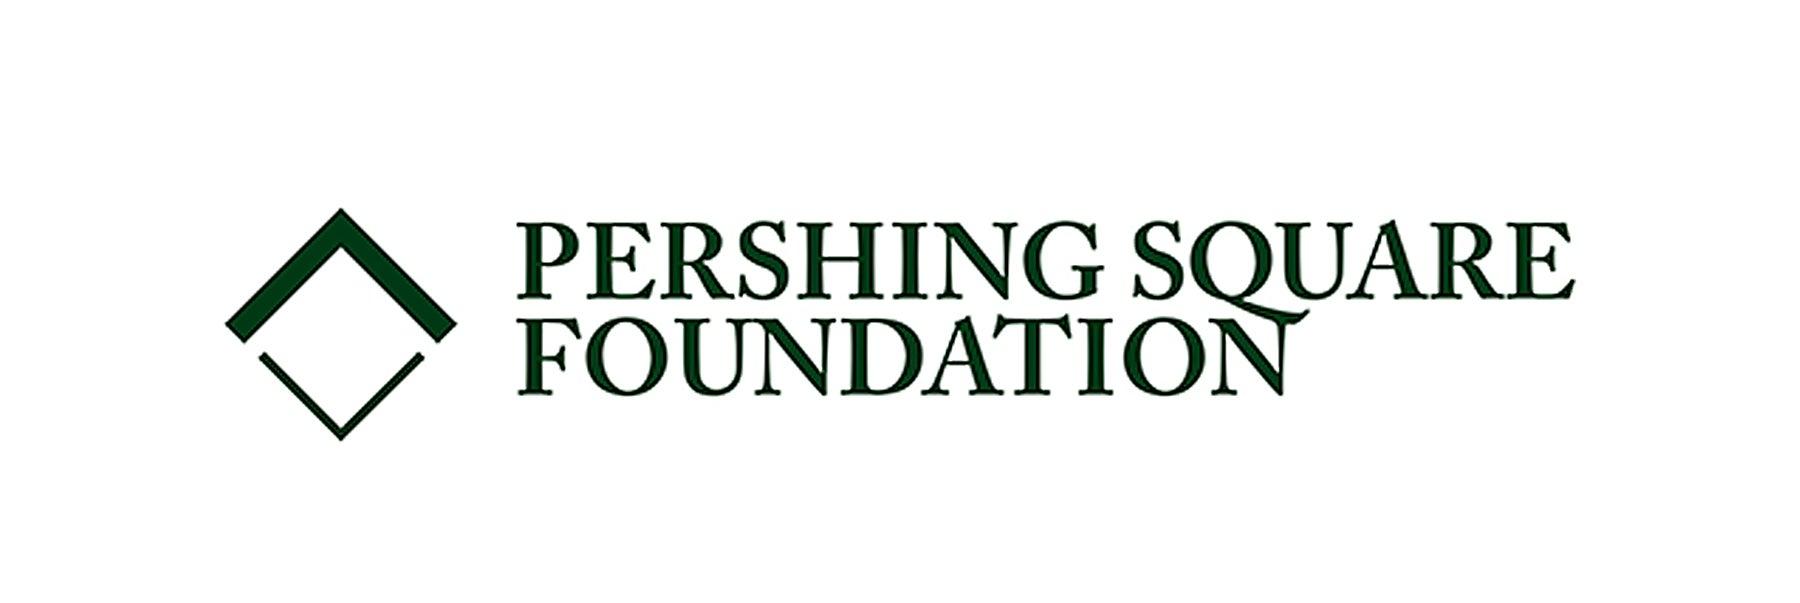 Pershing Square Foundation